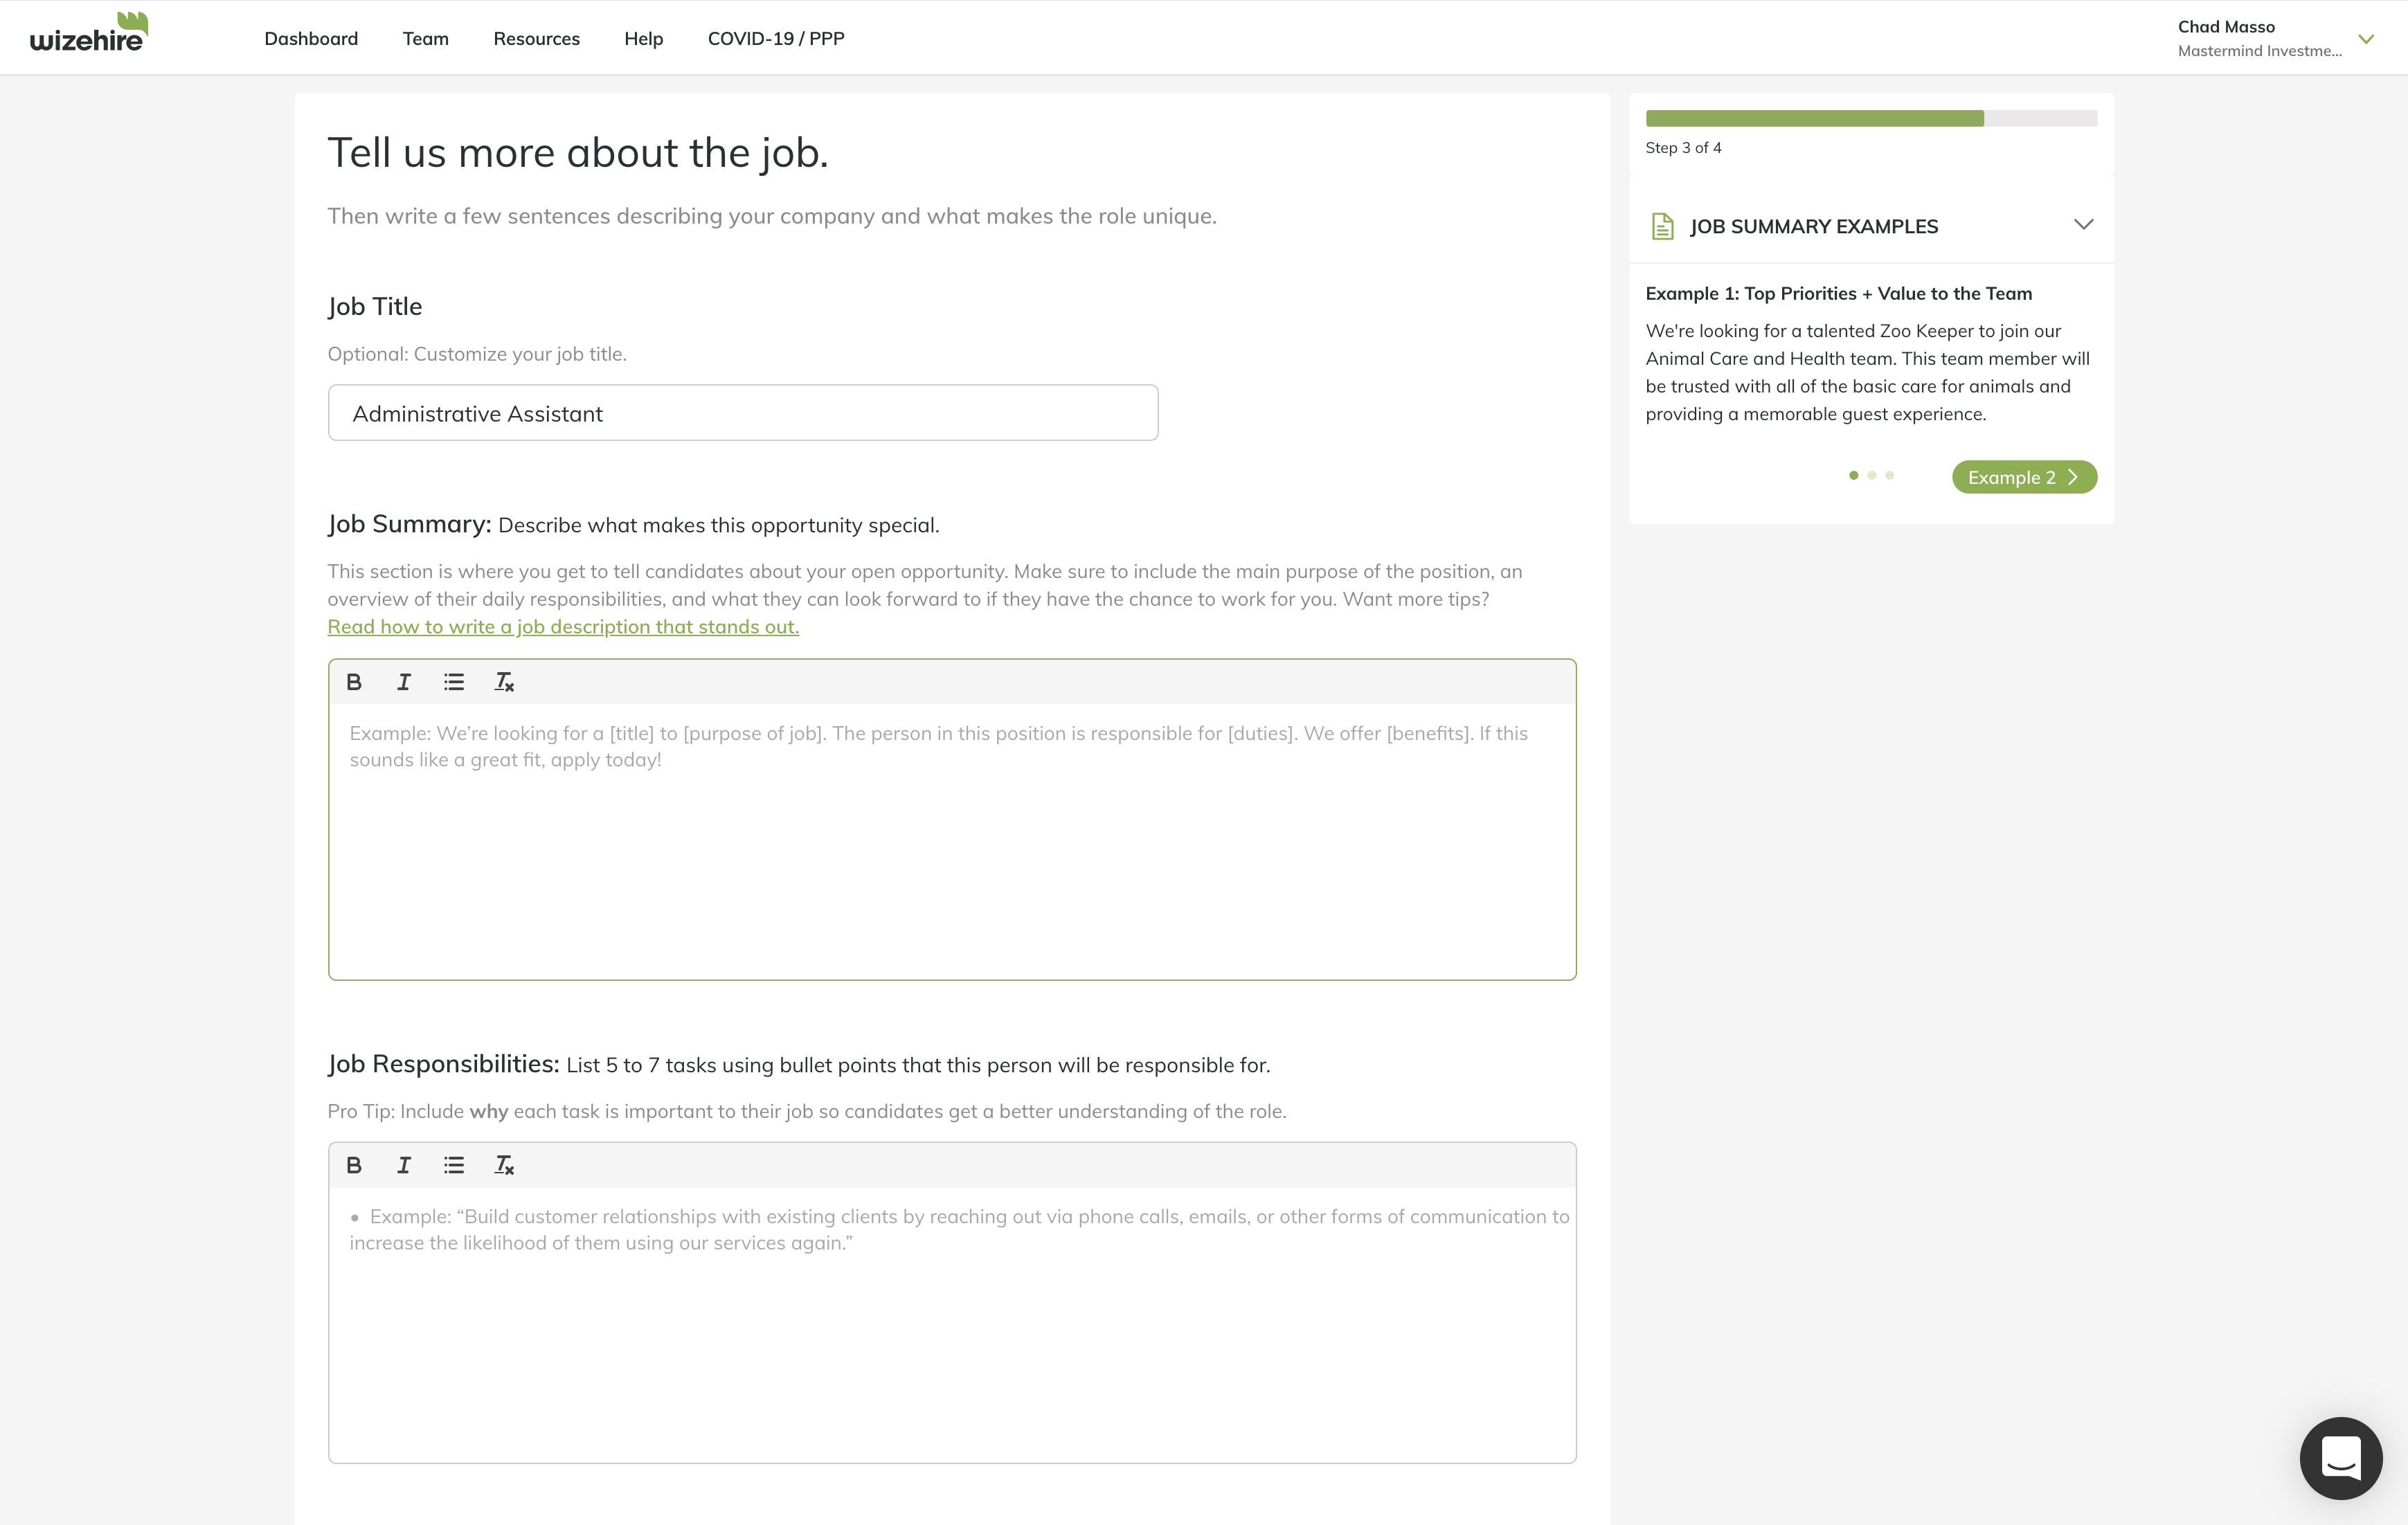 Job Posting Experience